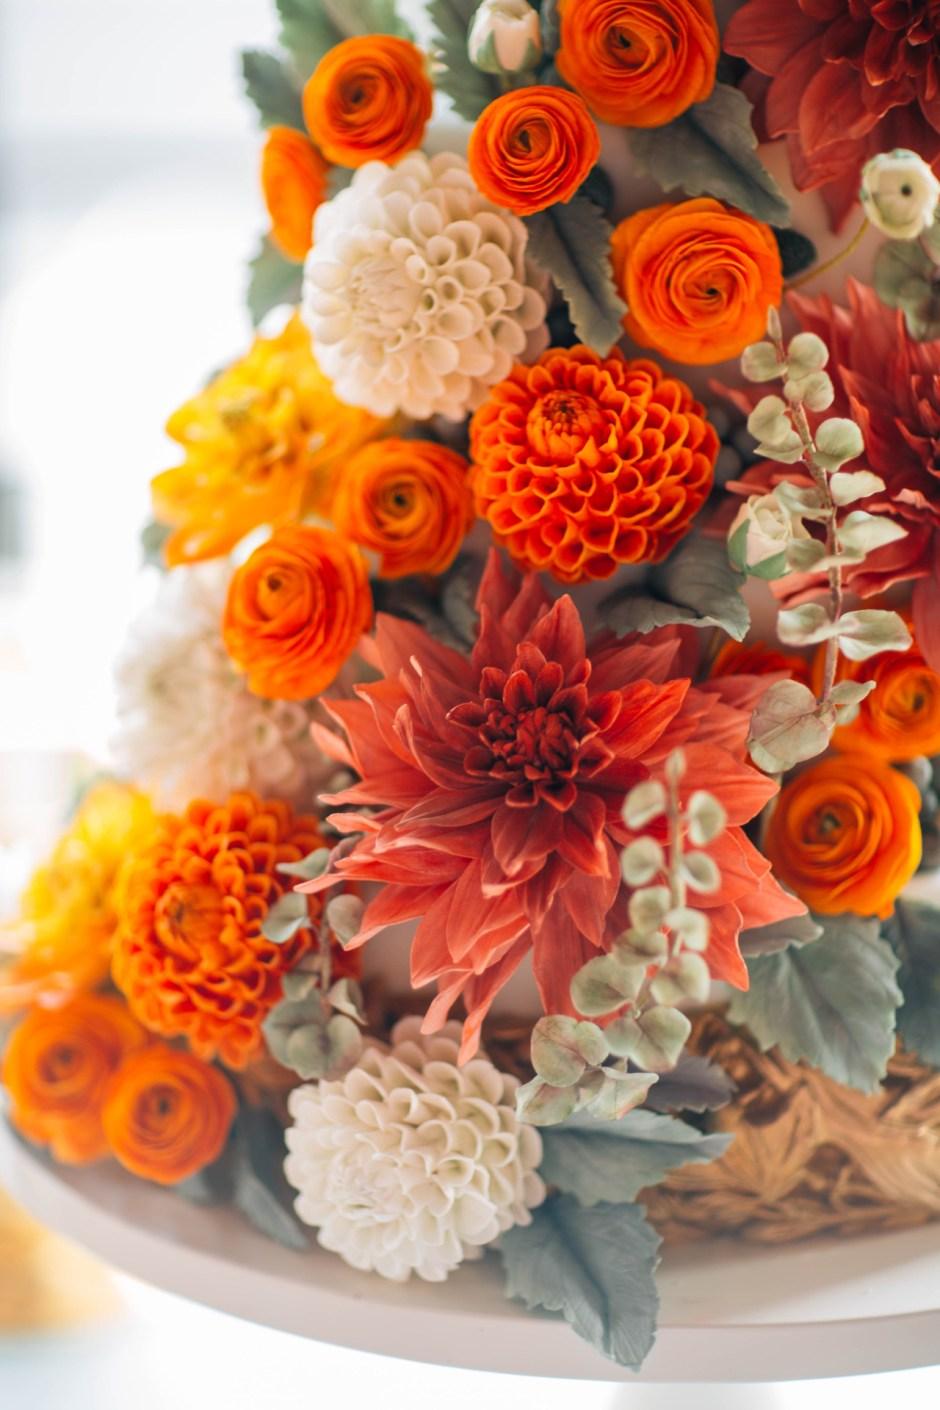 The Mischief Maker I Cakes, Sugar Flowers, Luxury Dessert Environments